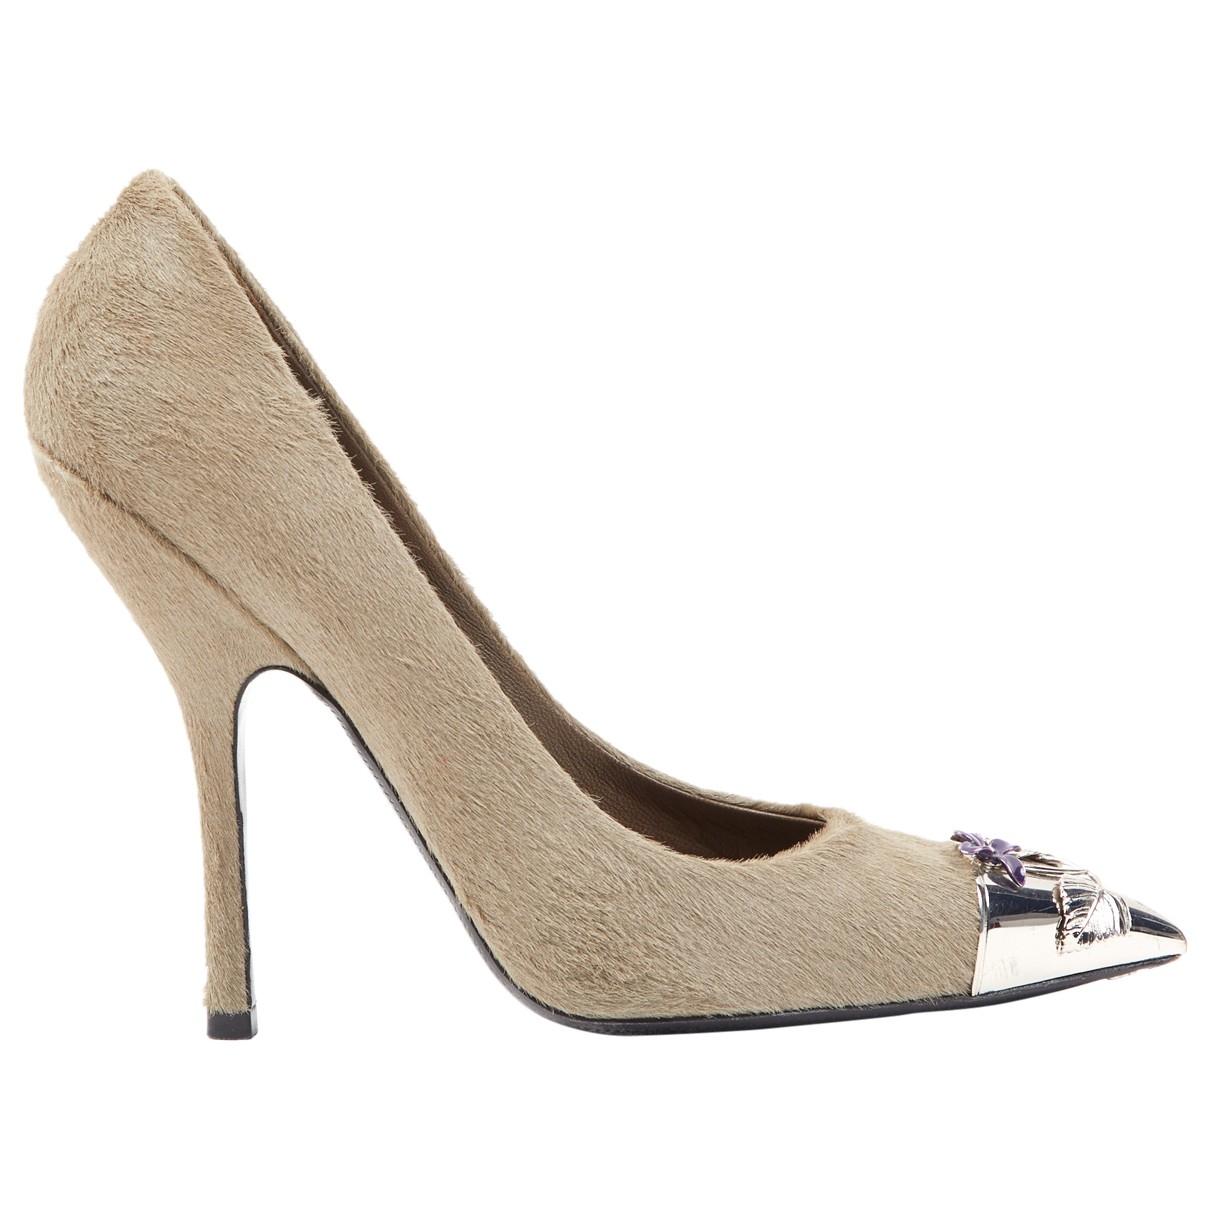 Louis Vuitton \N Grey Pony-style calfskin Heels for Women 38.5 EU